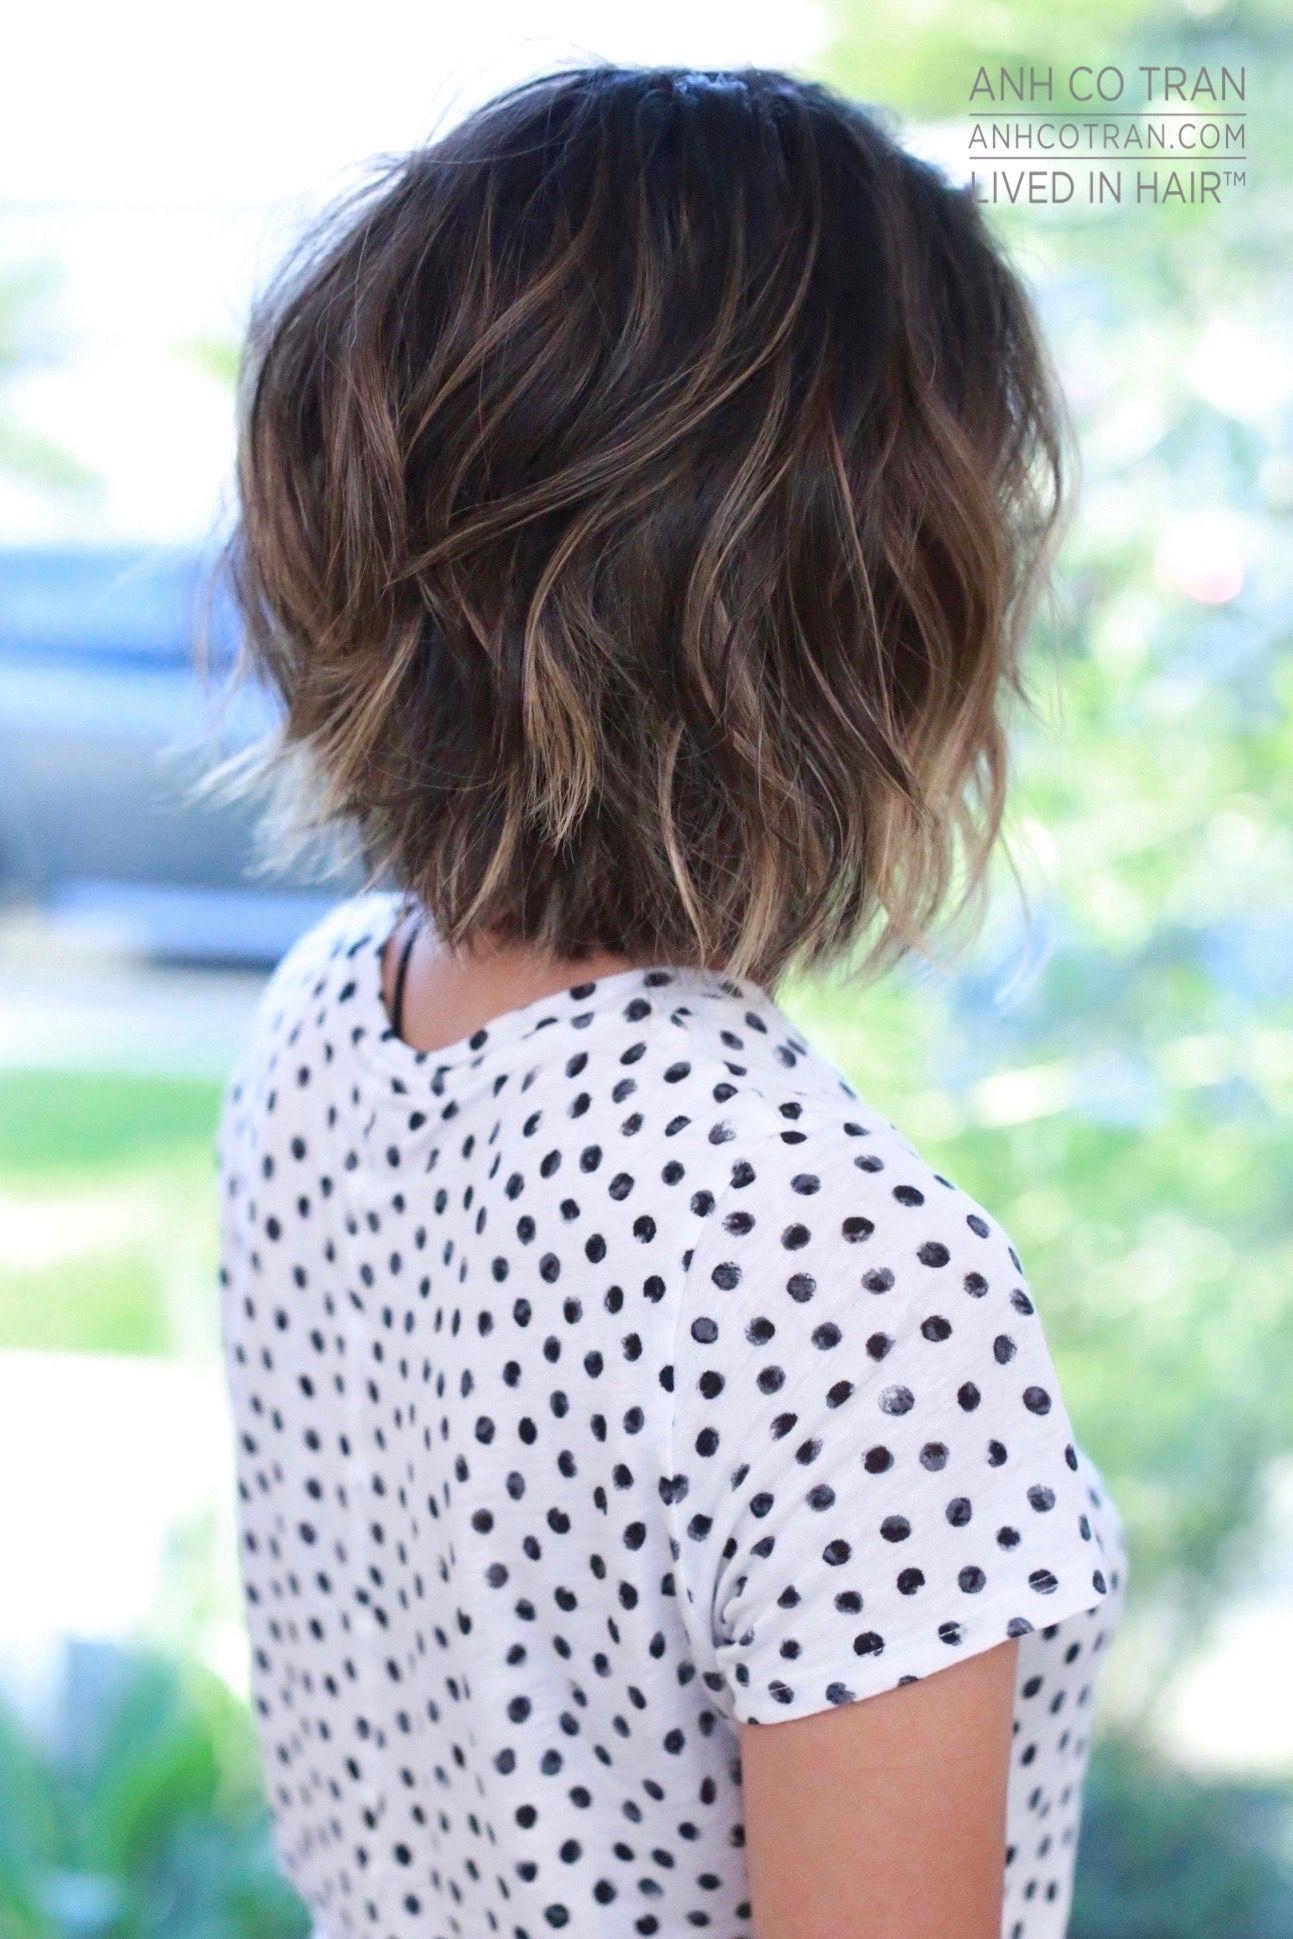 Anh Co Tran Beauty Haircut Ideas Pinterest Hair Style